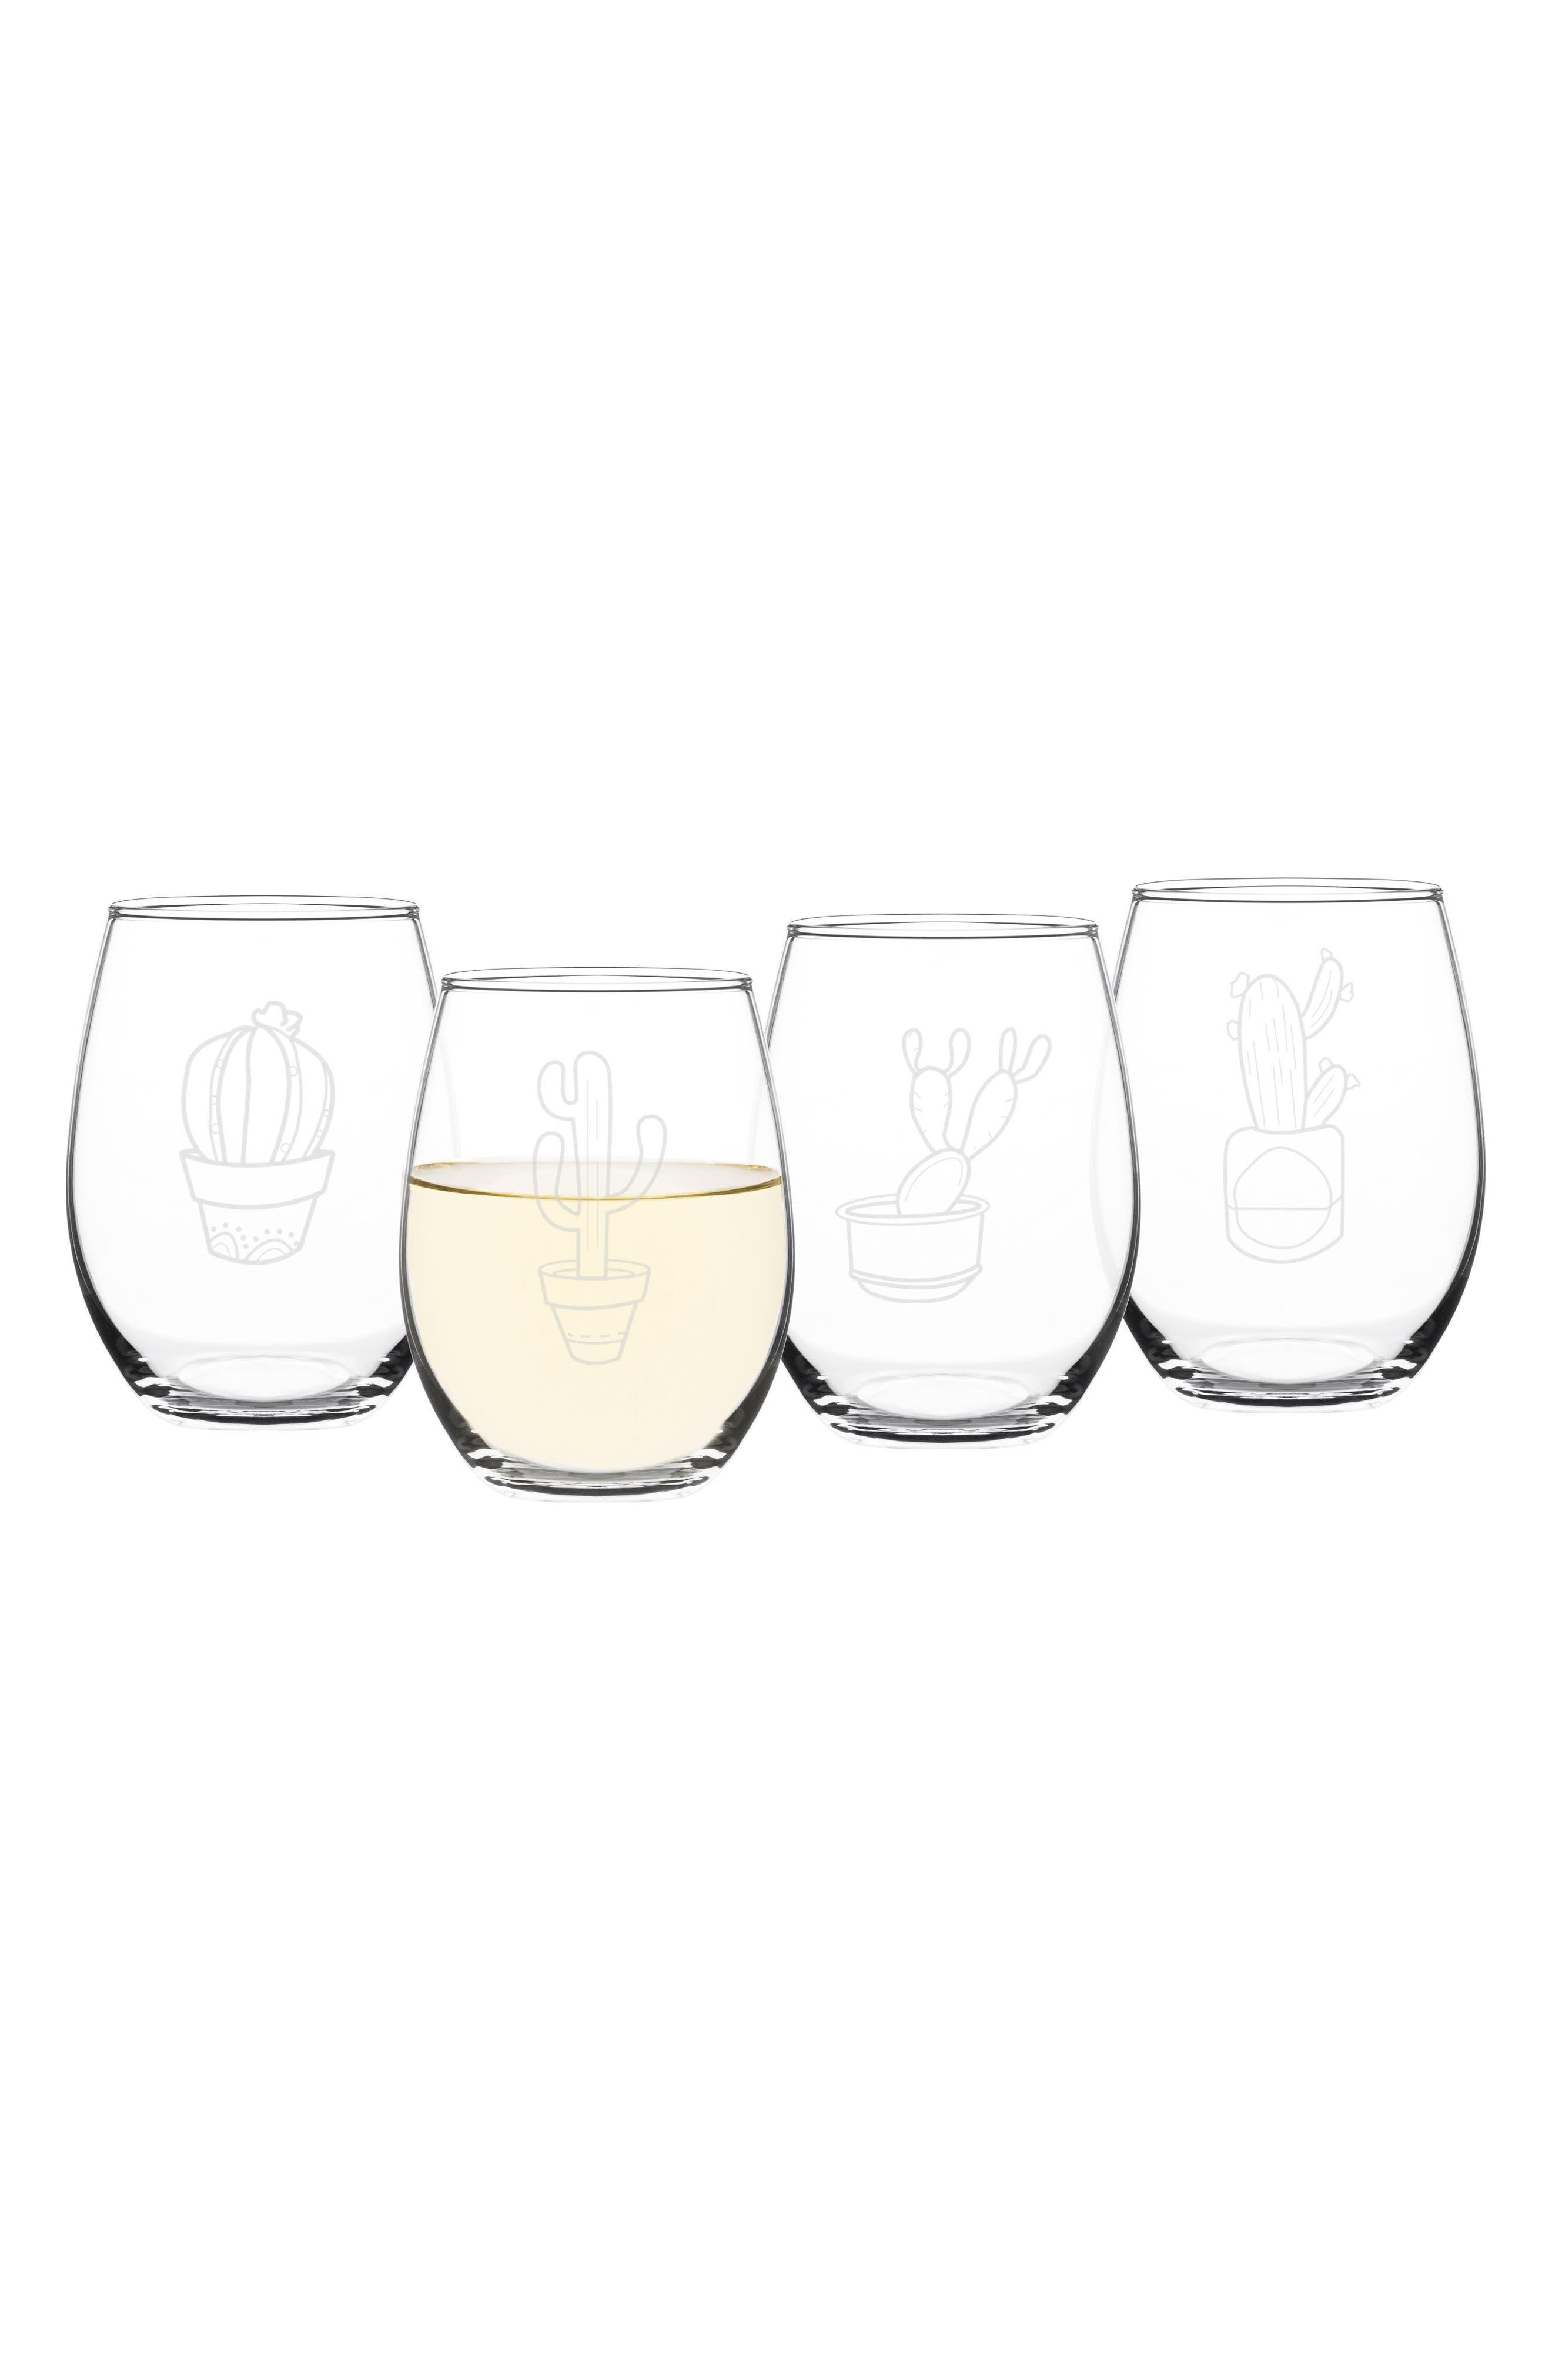 Cactus Set of 4 Stemless Wine Glasses,                             Alternate thumbnail 2, color,                             100